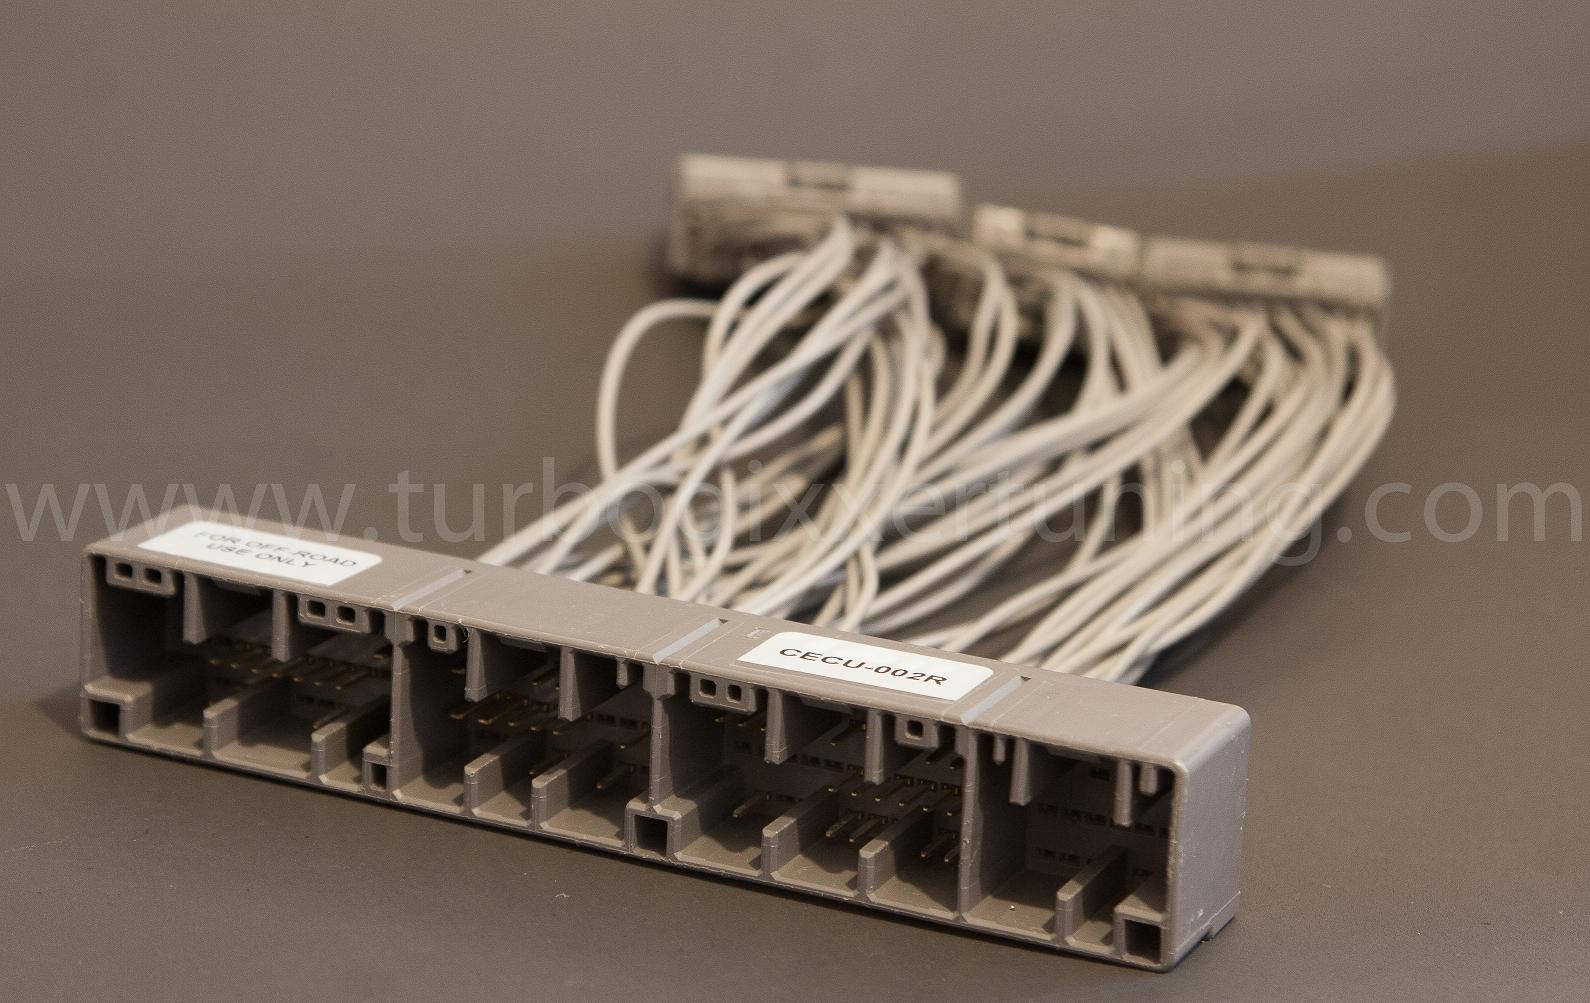 Obd B Wire Harness on